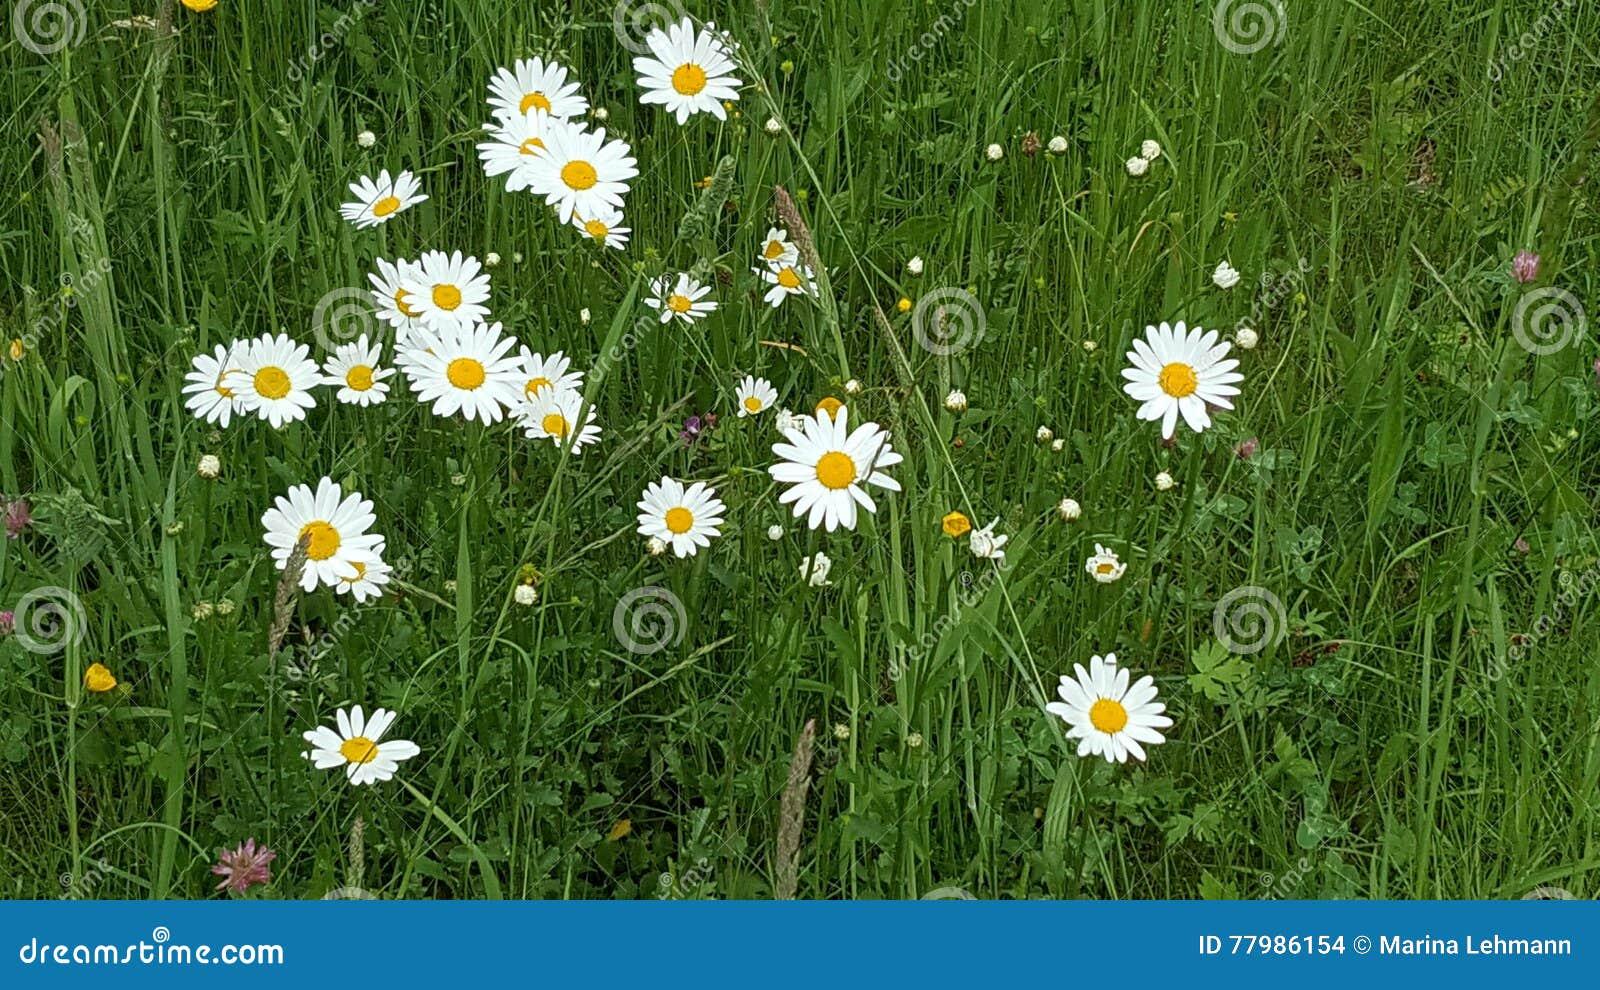 Flowers Weed Meadow Daisy Stock Photo Image Of Botanischer 77986154